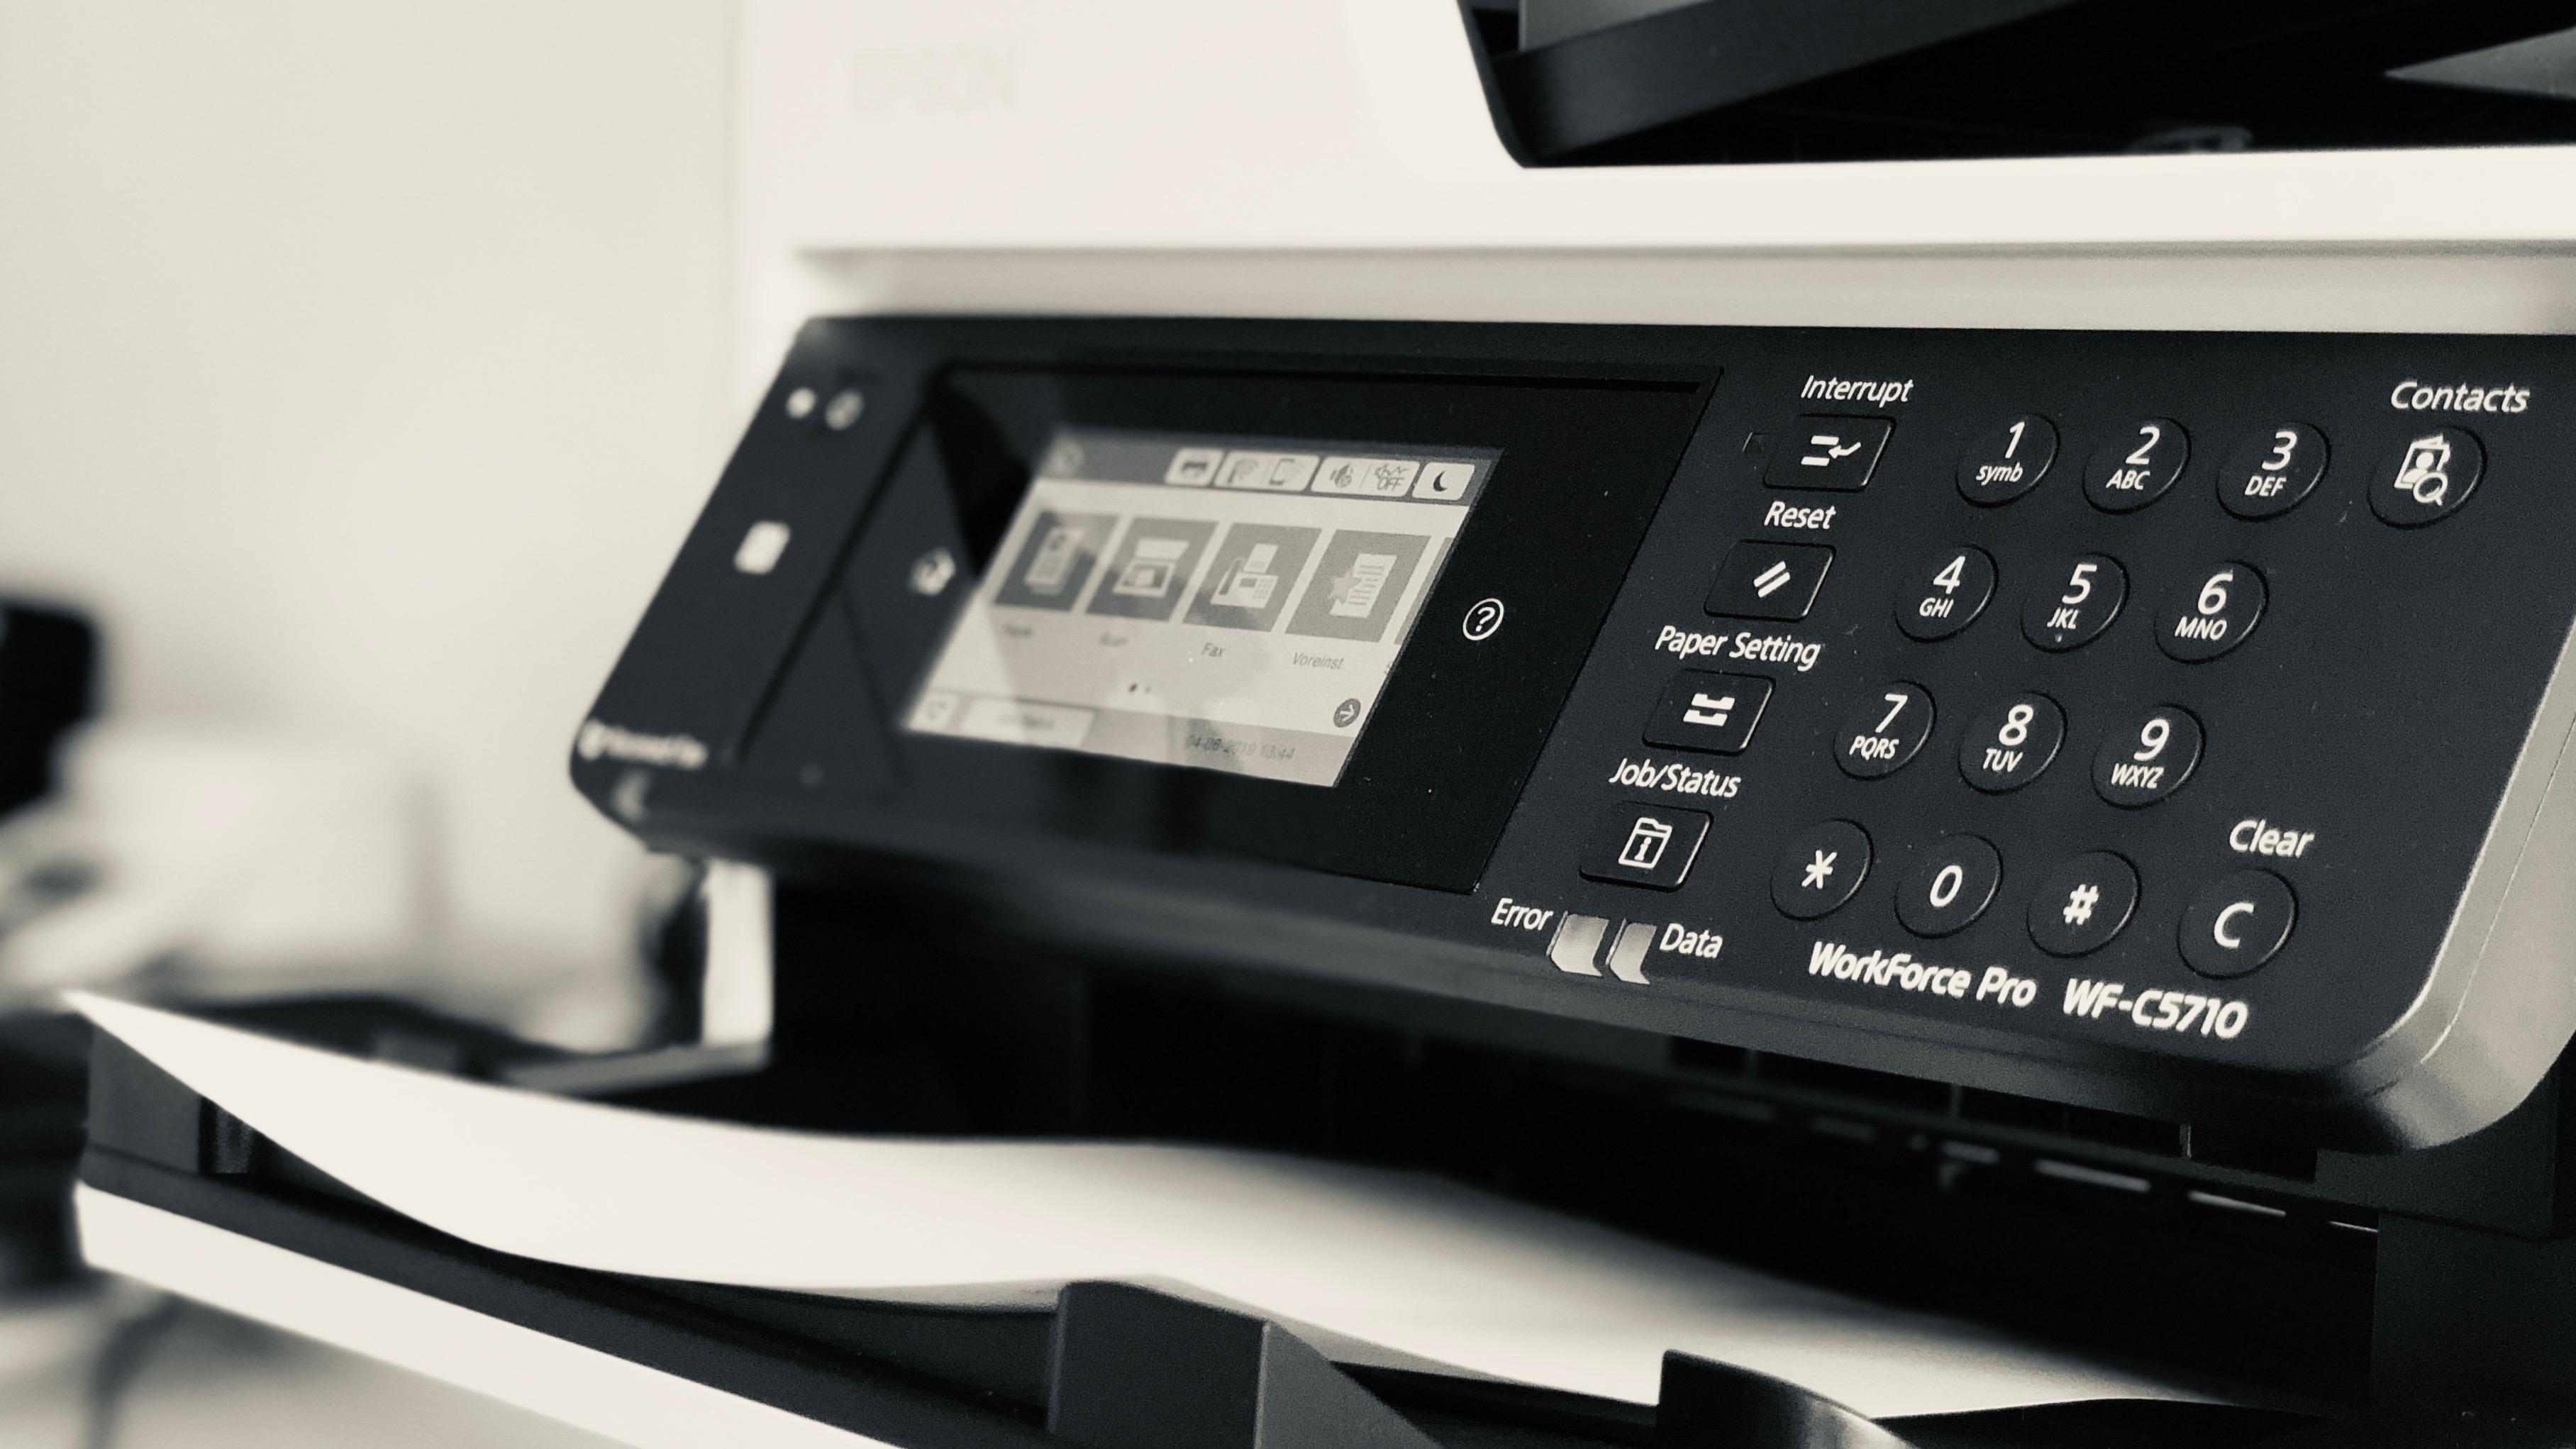 Datenschutzrisiko Drucker